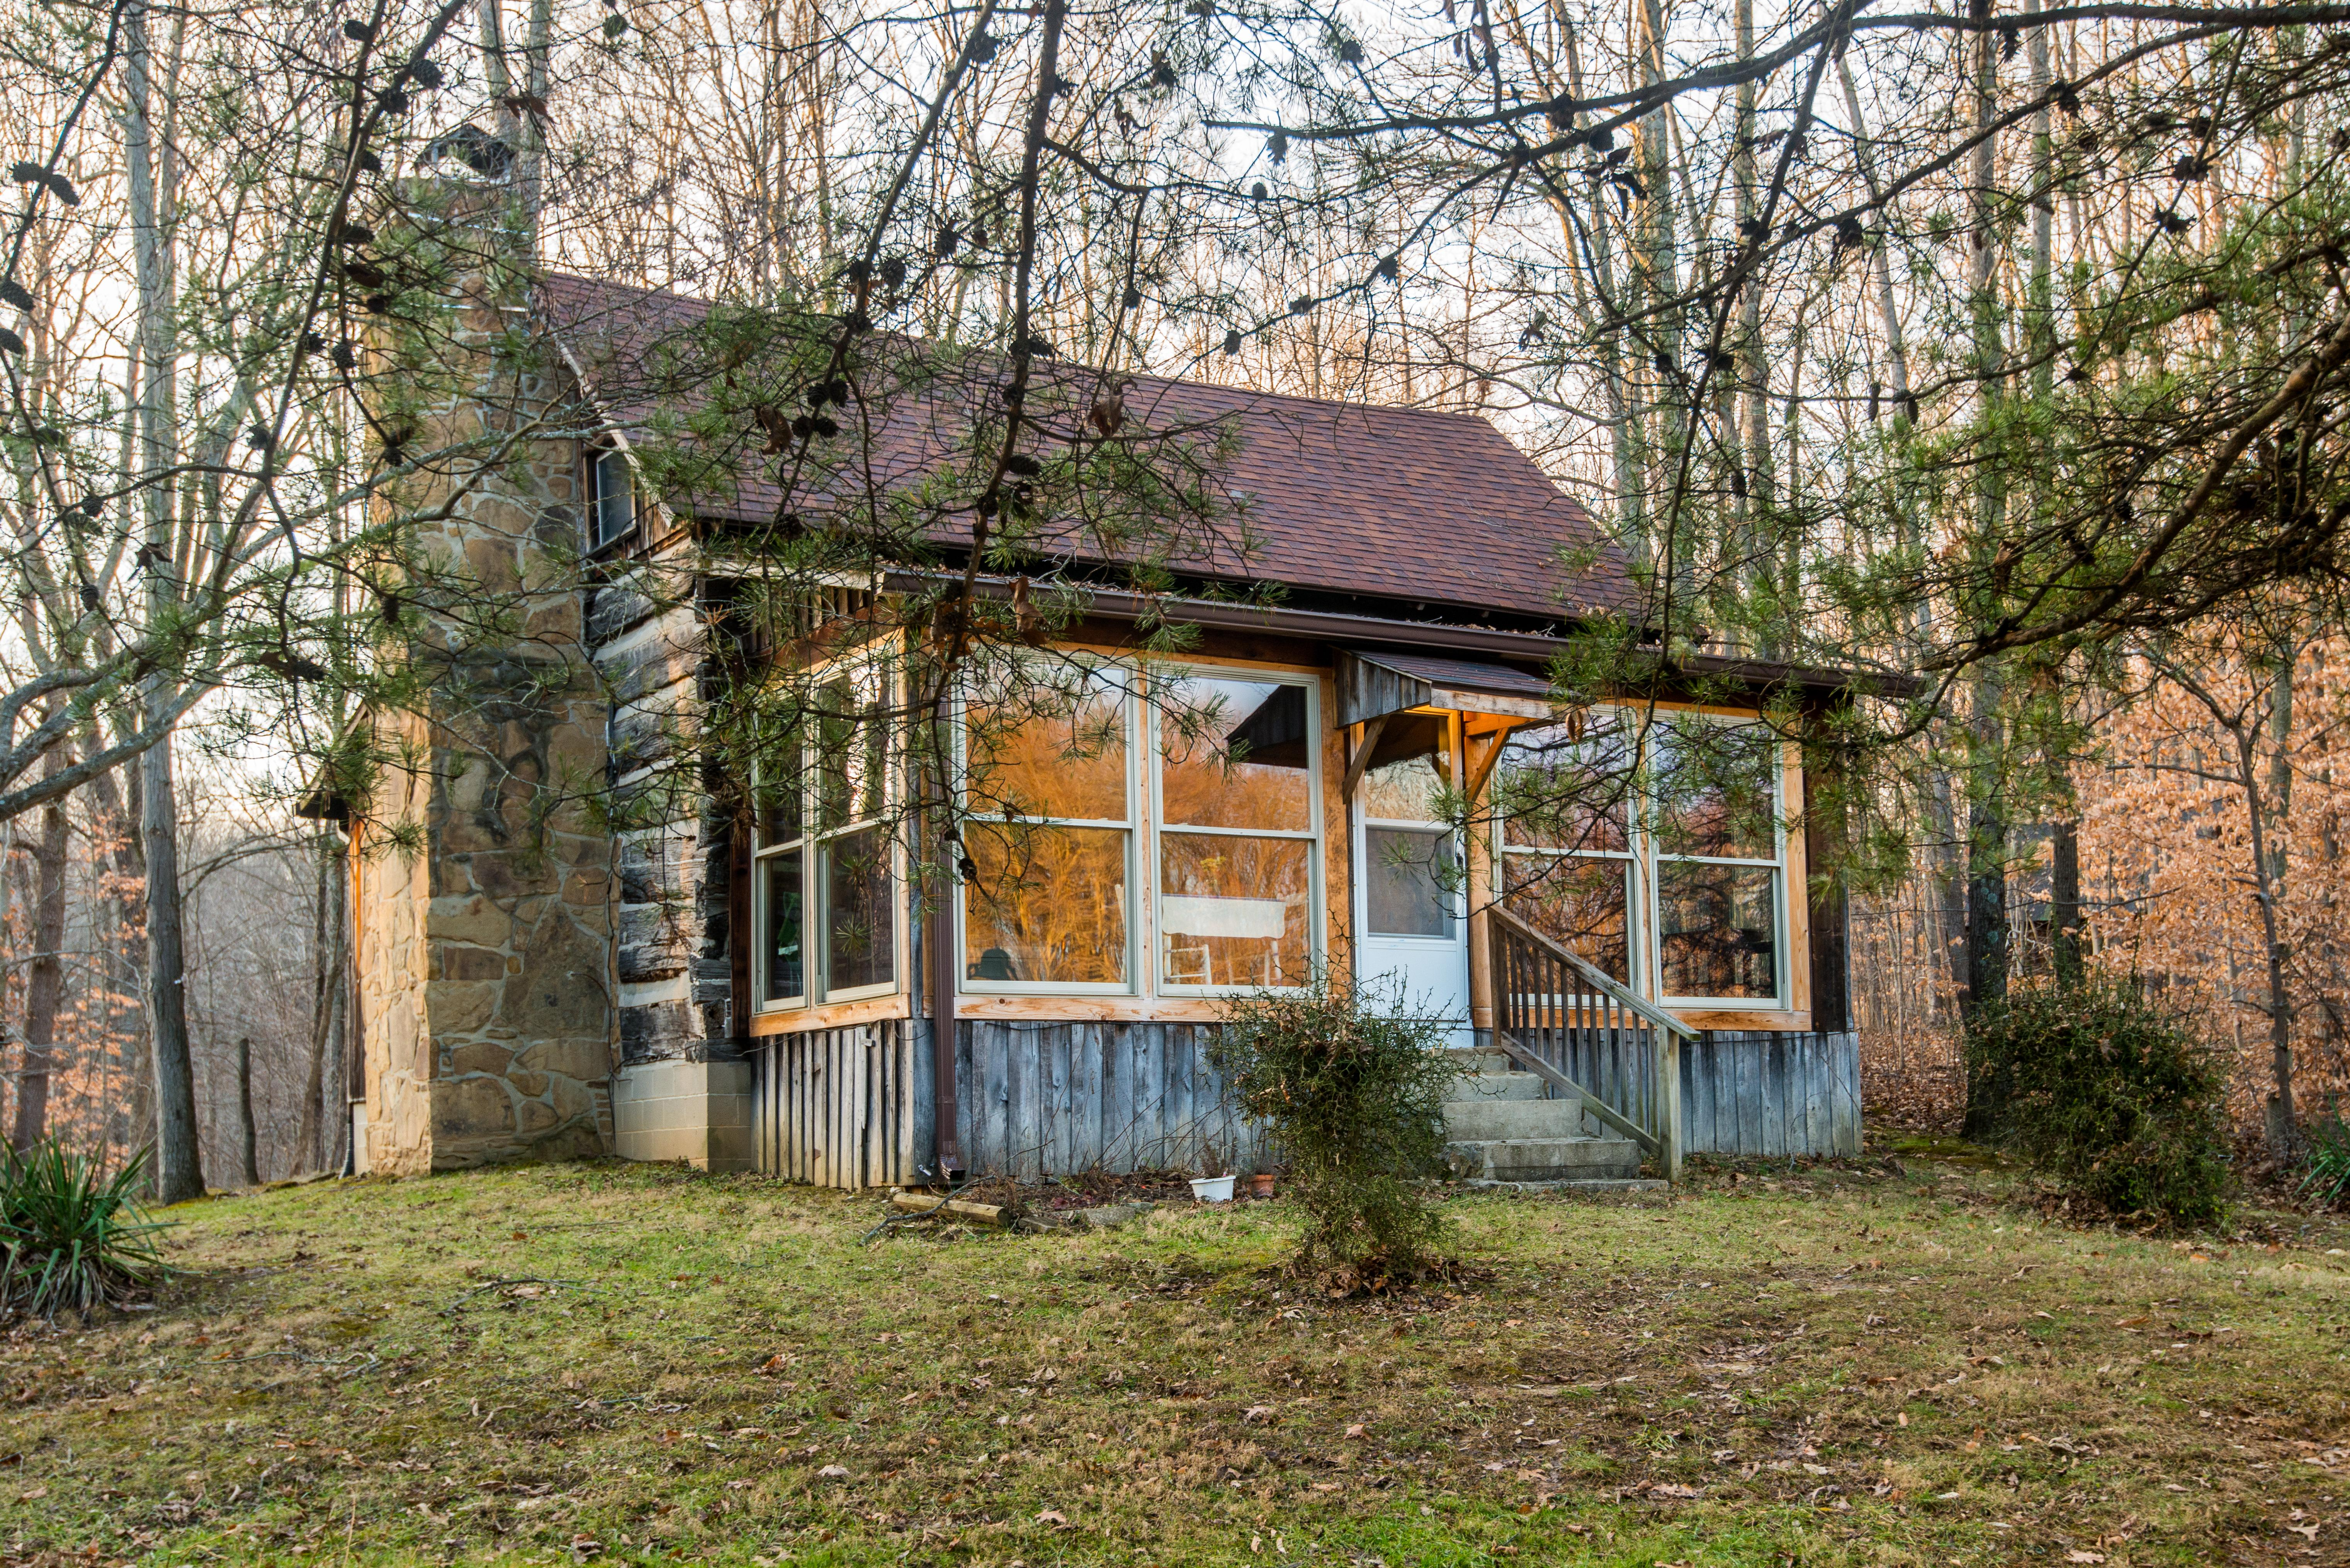 Lake Hideaway Log Cabin – Brown County Log Cabins